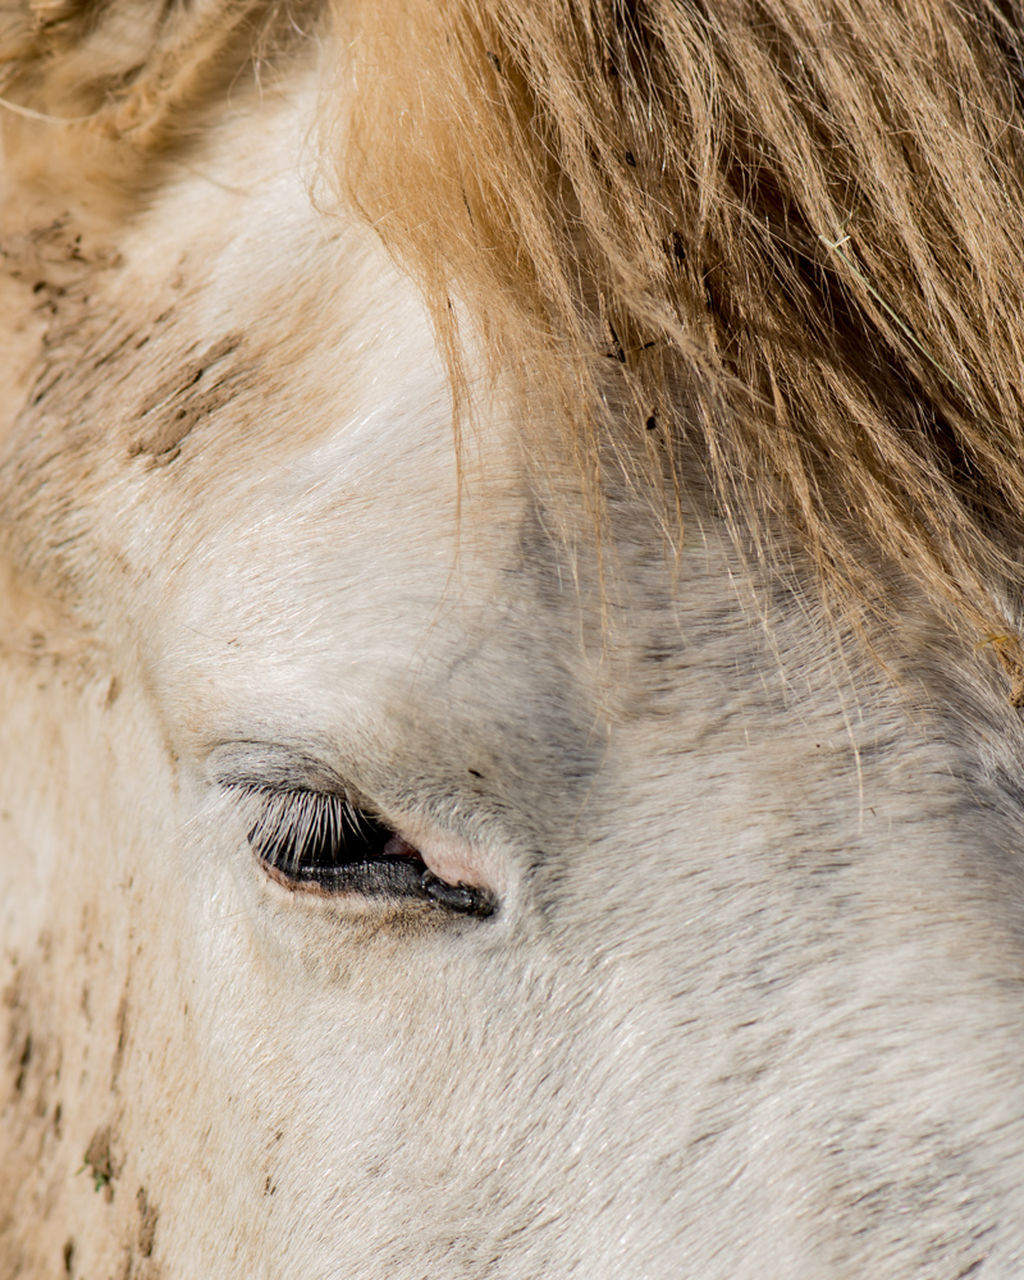 domestic animals, animal body part, one animal, livestock, mammal, animal themes, animal head, close-up, day, outdoors, no people, eyelash